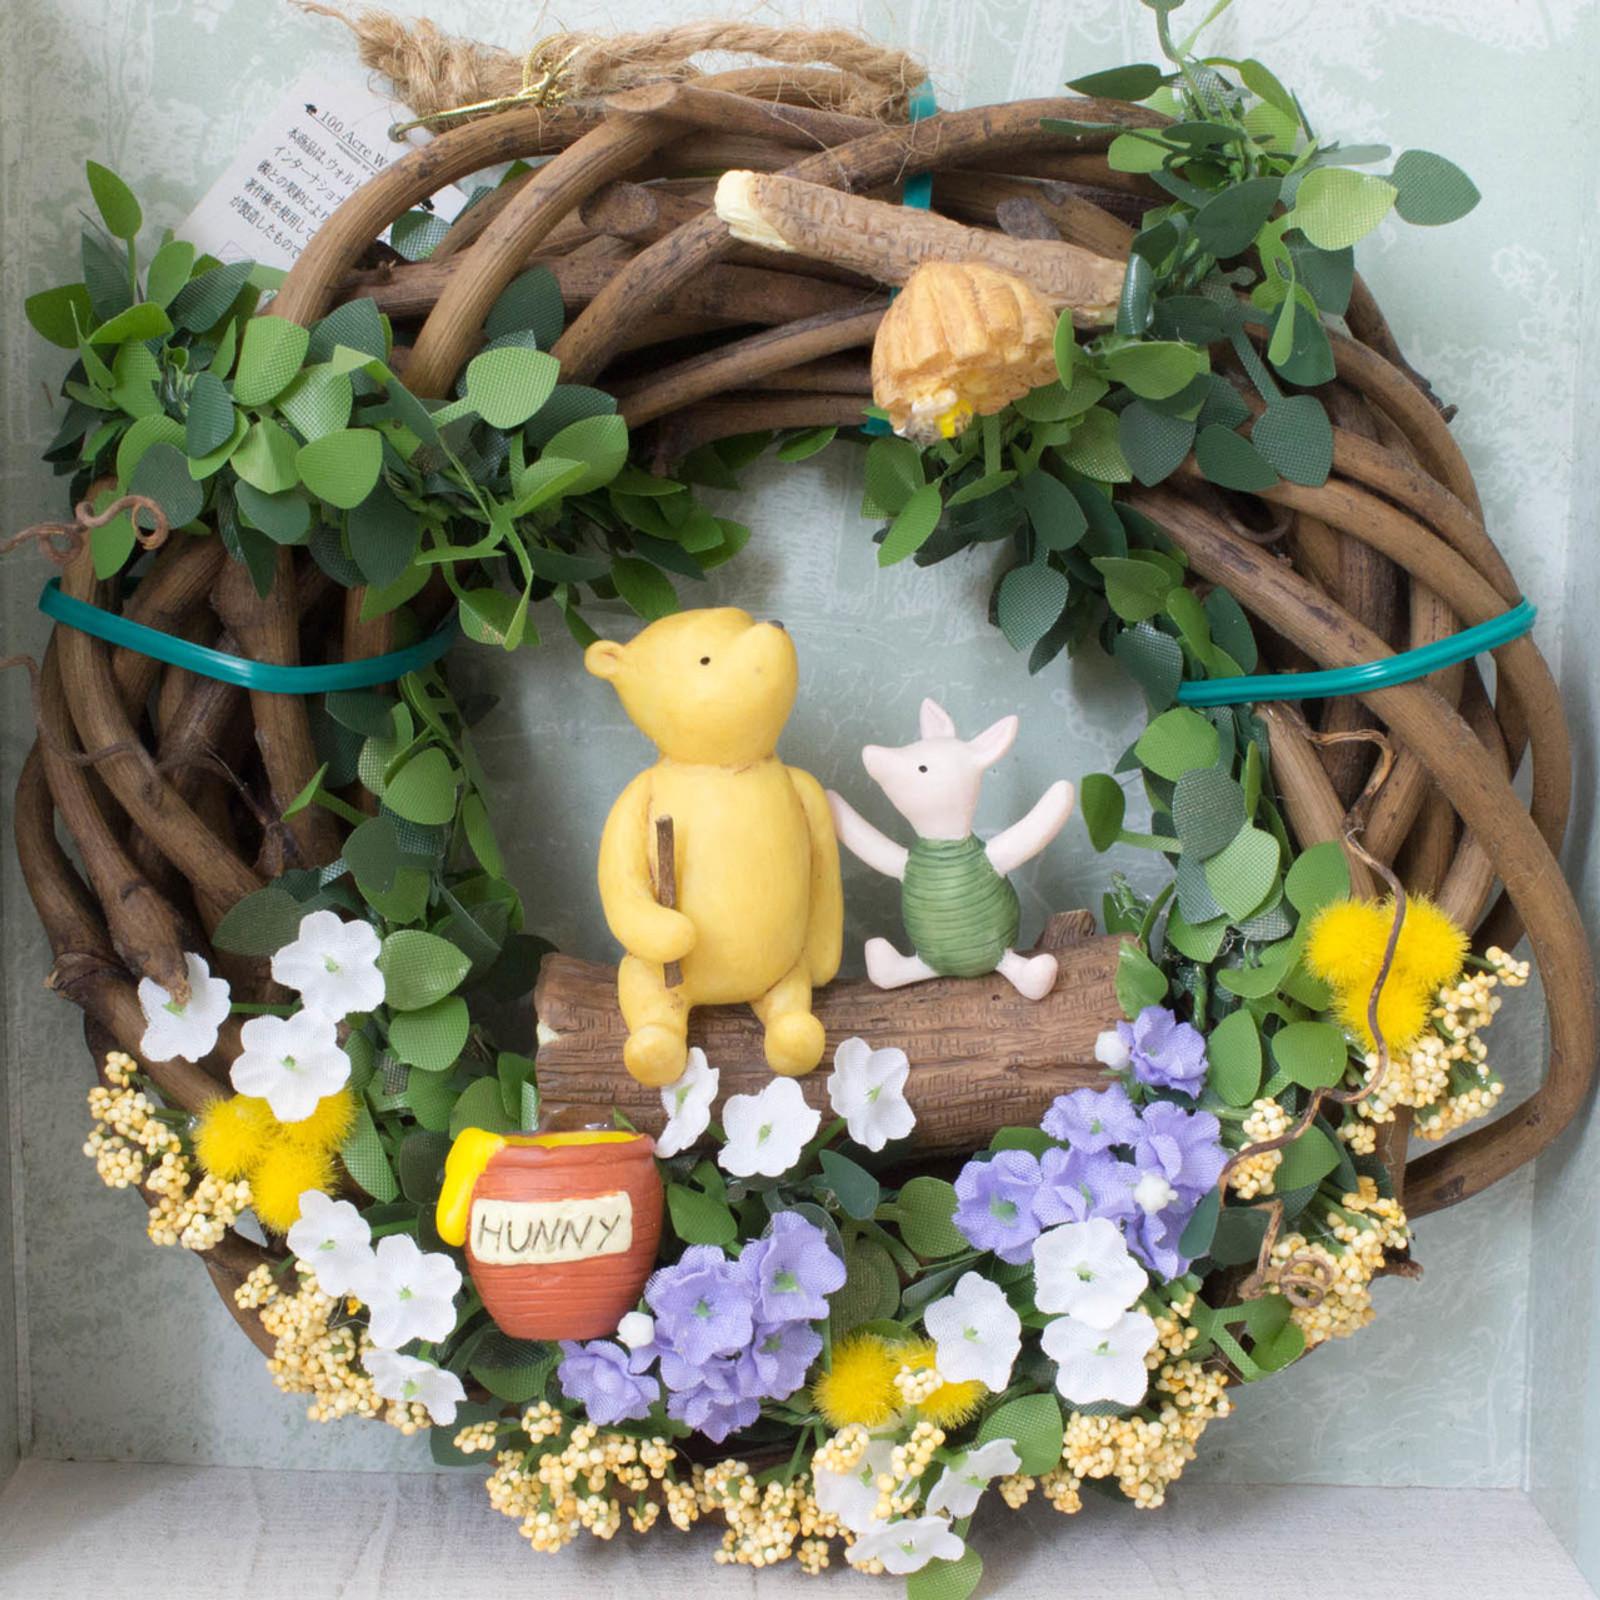 RARE!! Winnie the Pooh Classic Pooh & Piglet Mini Figure Wreath Benelic JAPAN